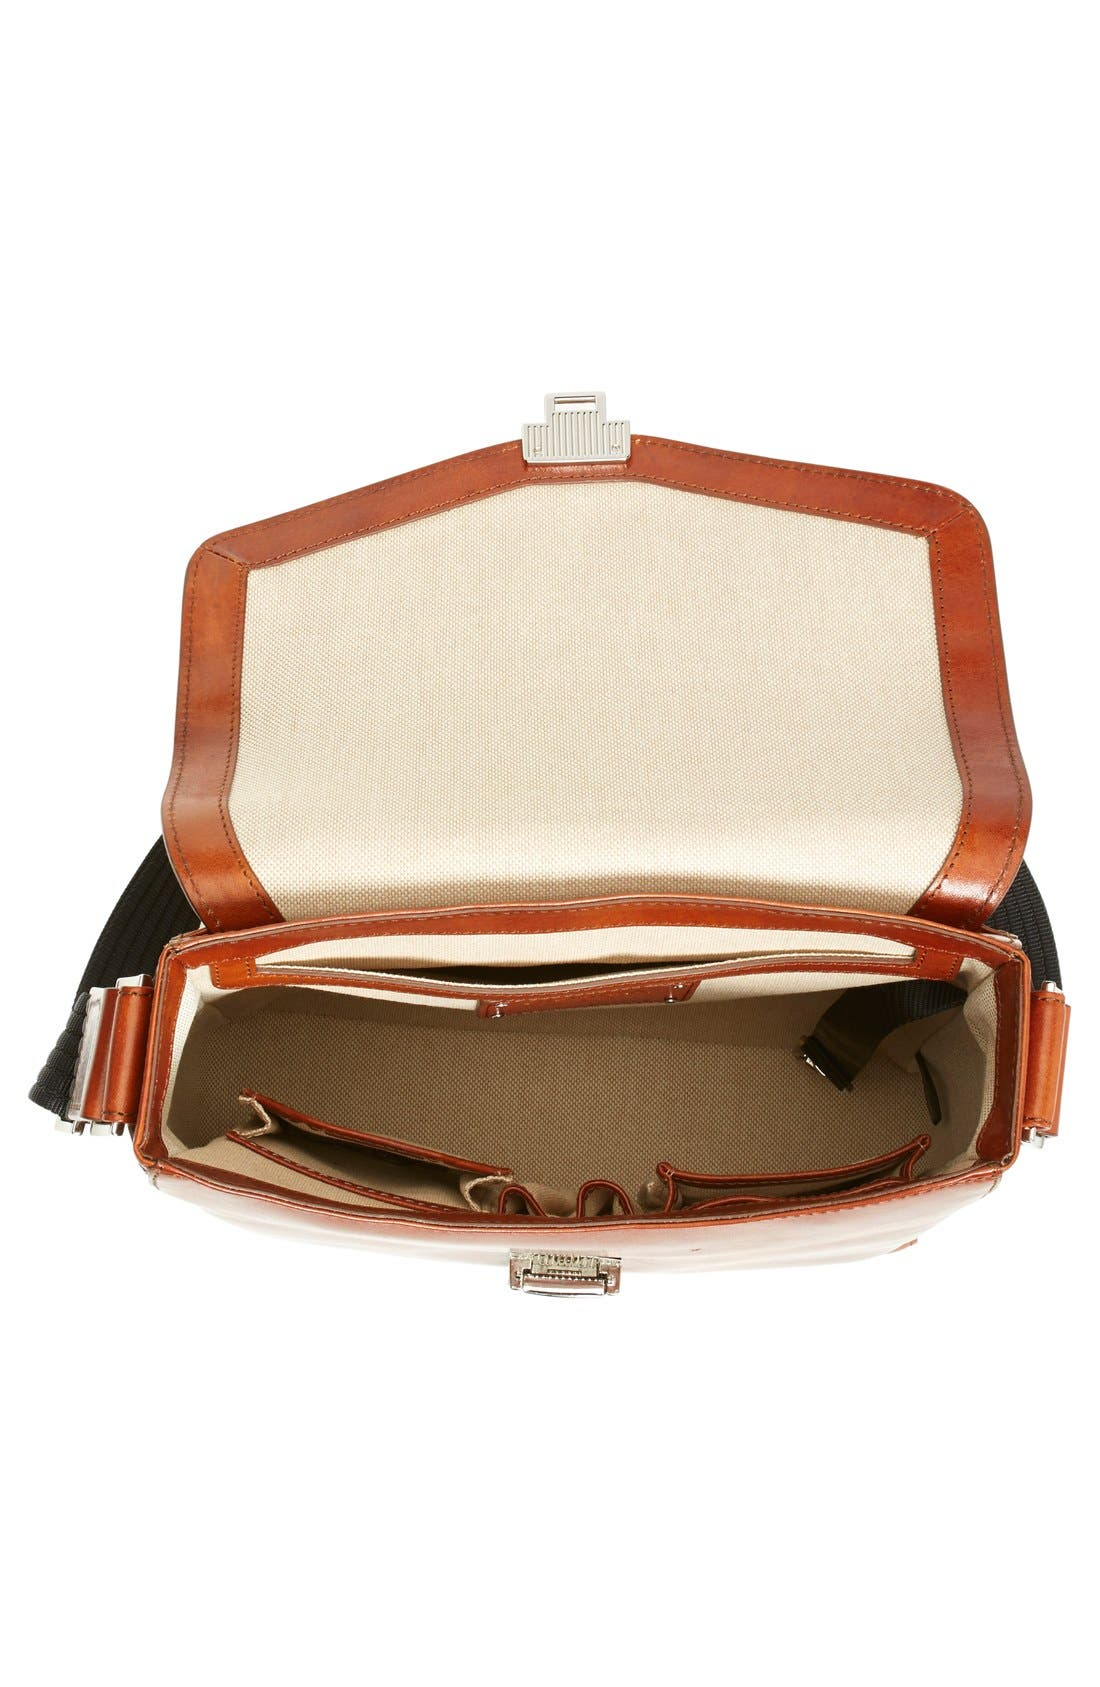 'Man Bag' Leather Crossbody Bag,                             Alternate thumbnail 4, color,                             233